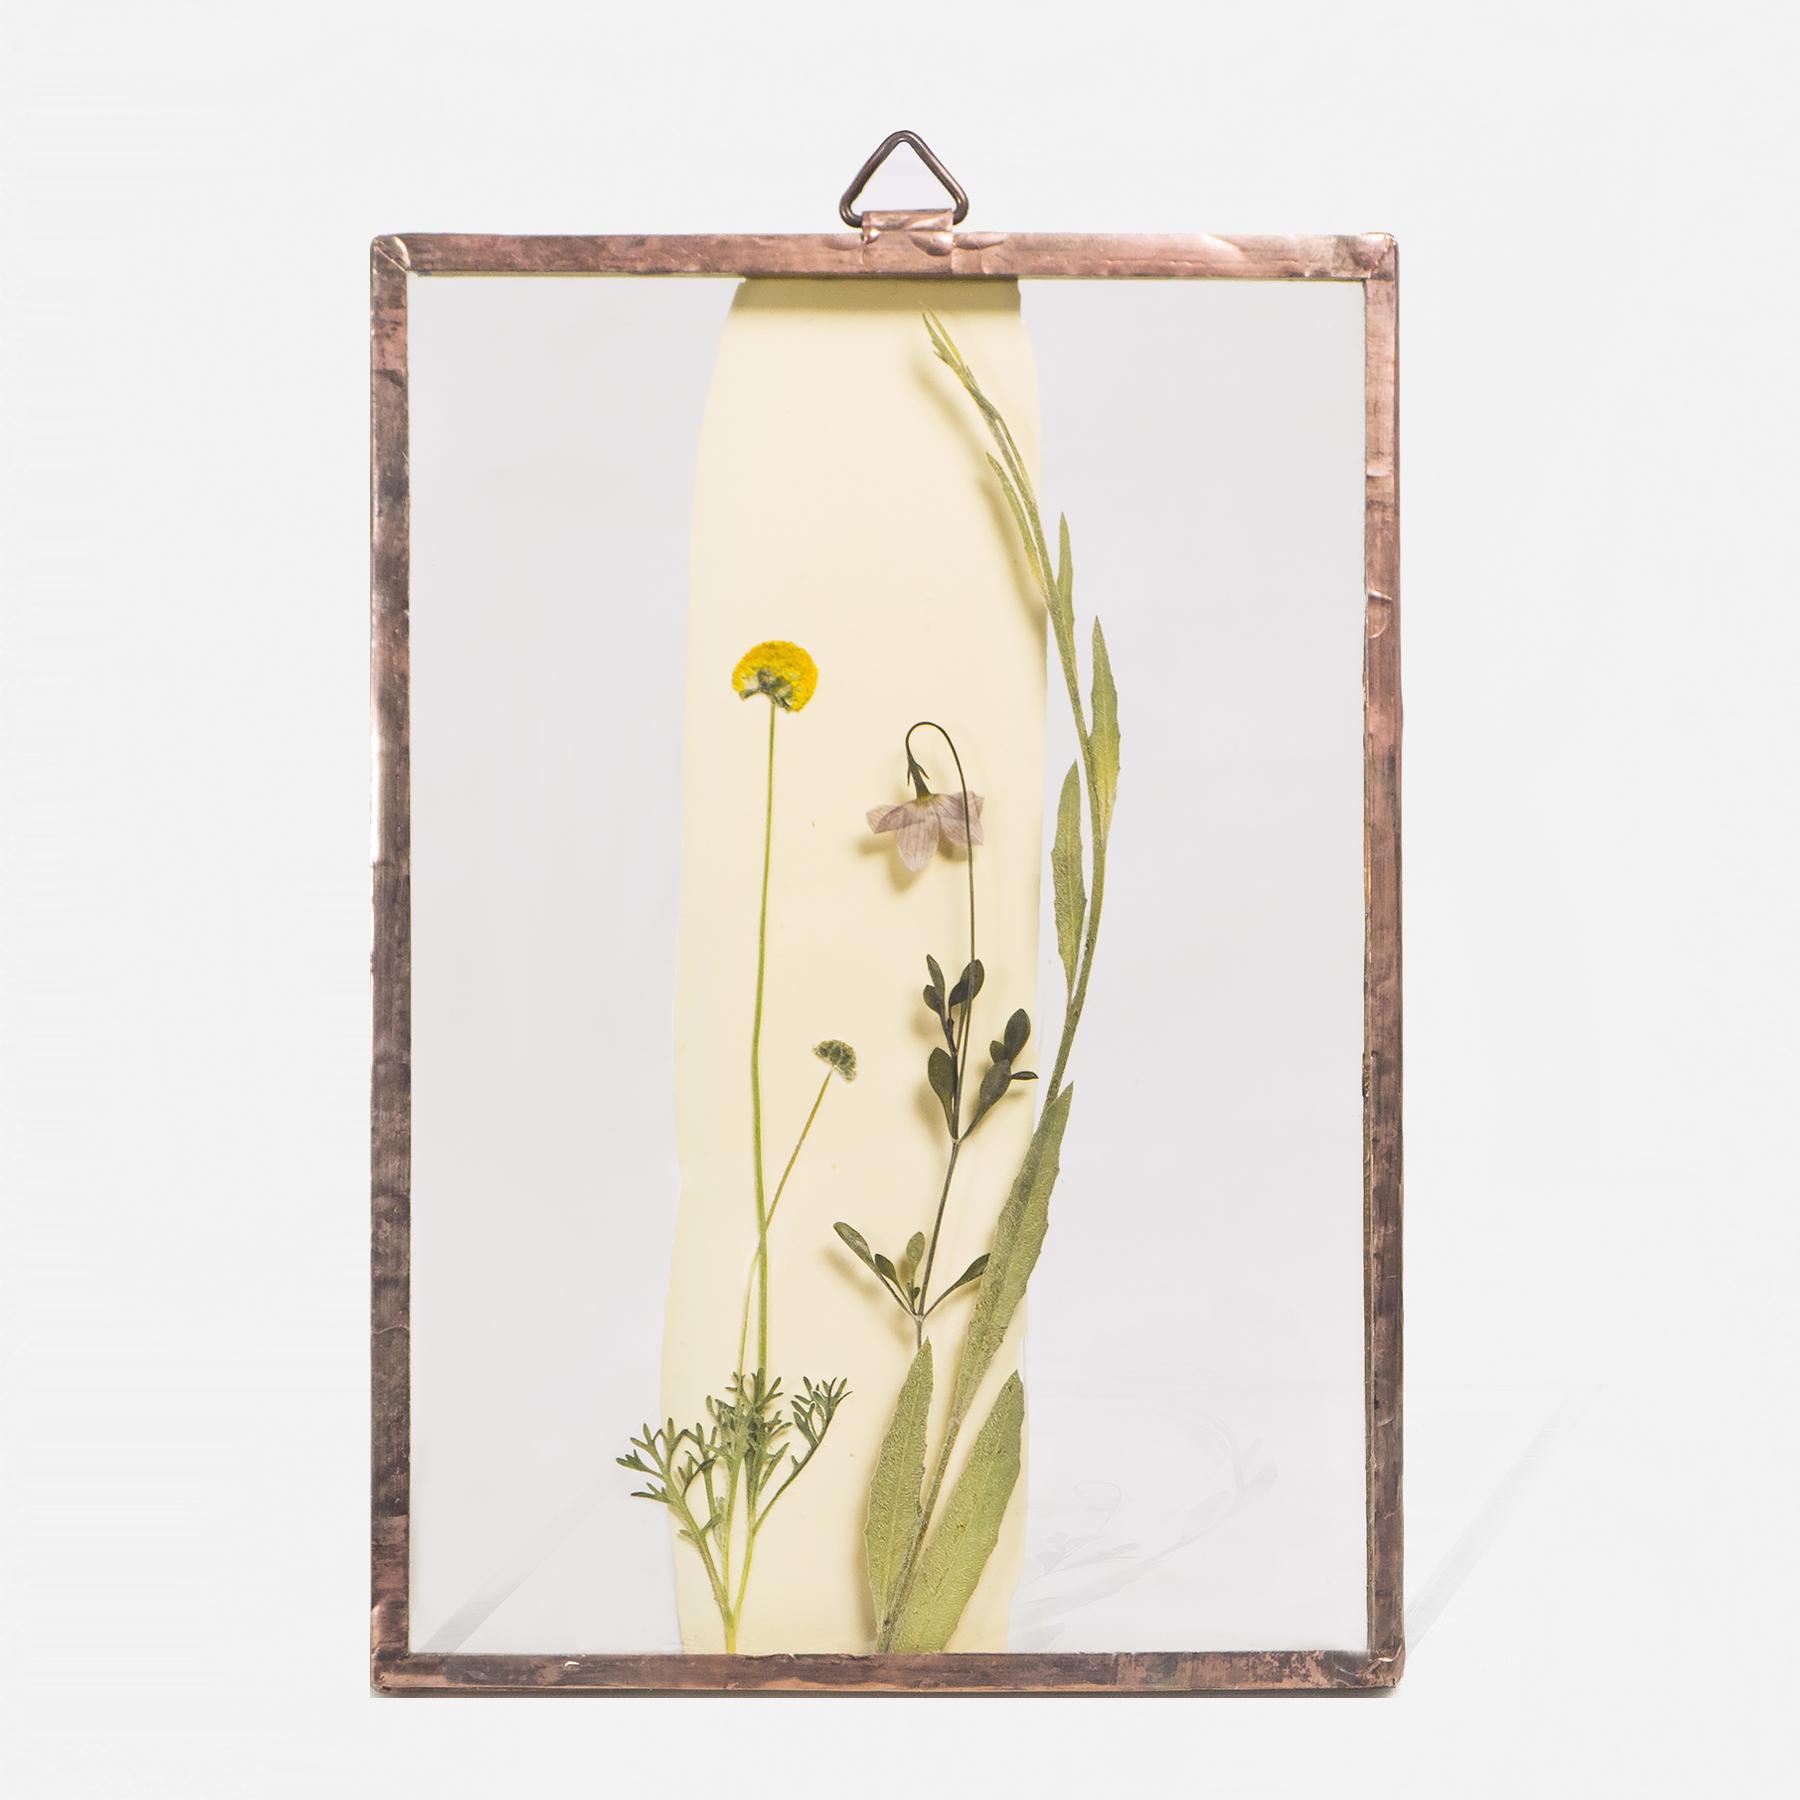 Botanical Frame S029 - Copper